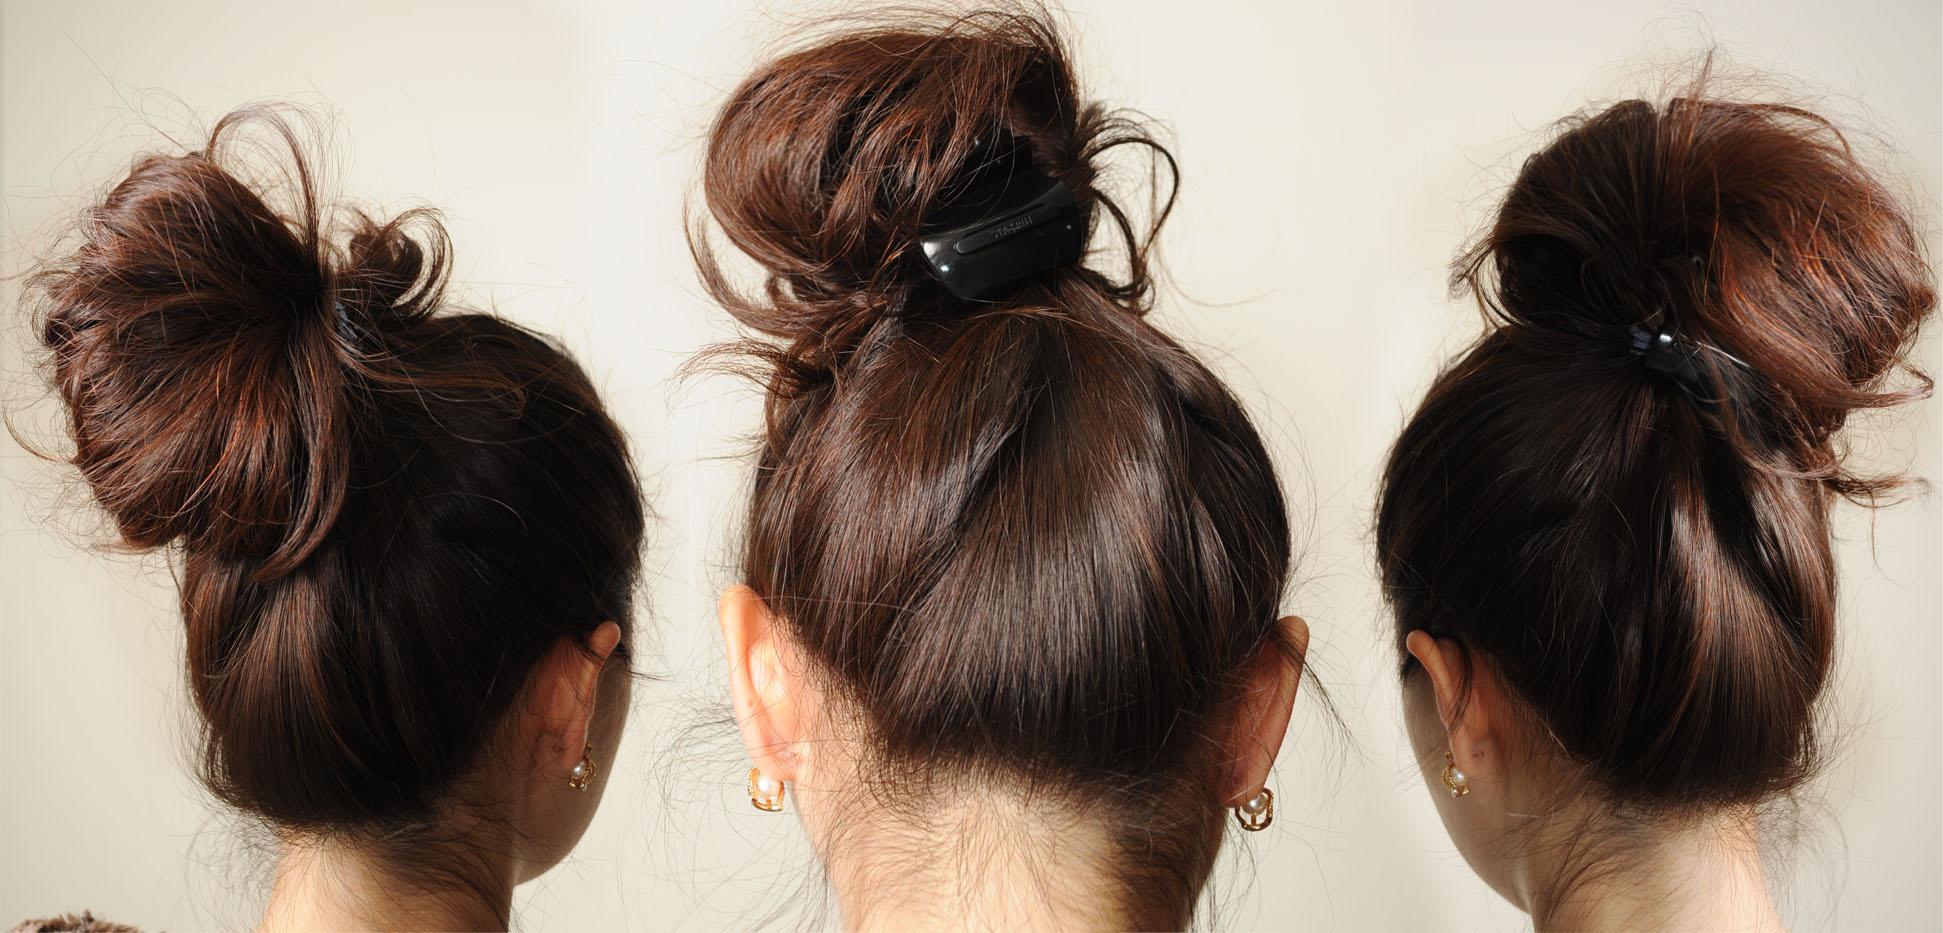 Hair Bun Tutorial Thirstythought - Hairstyle bun tutorials